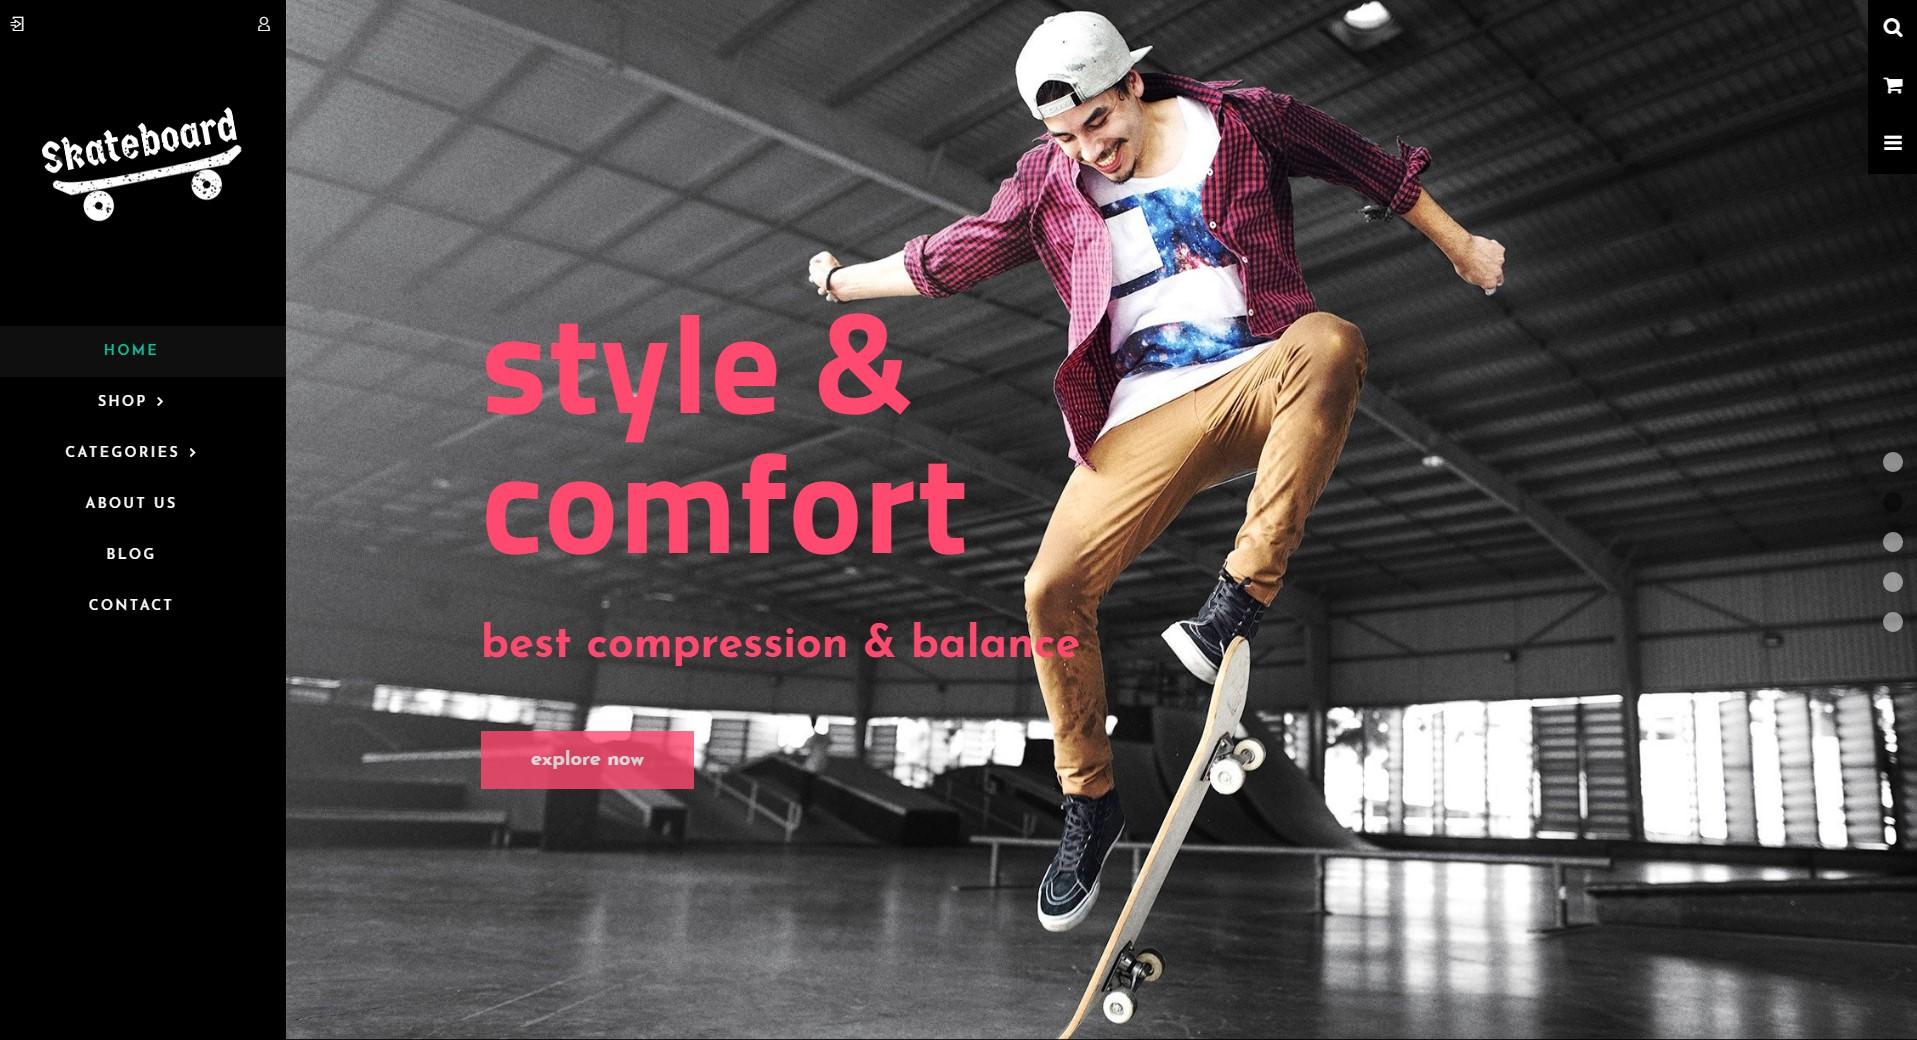 Skate board Sports theme